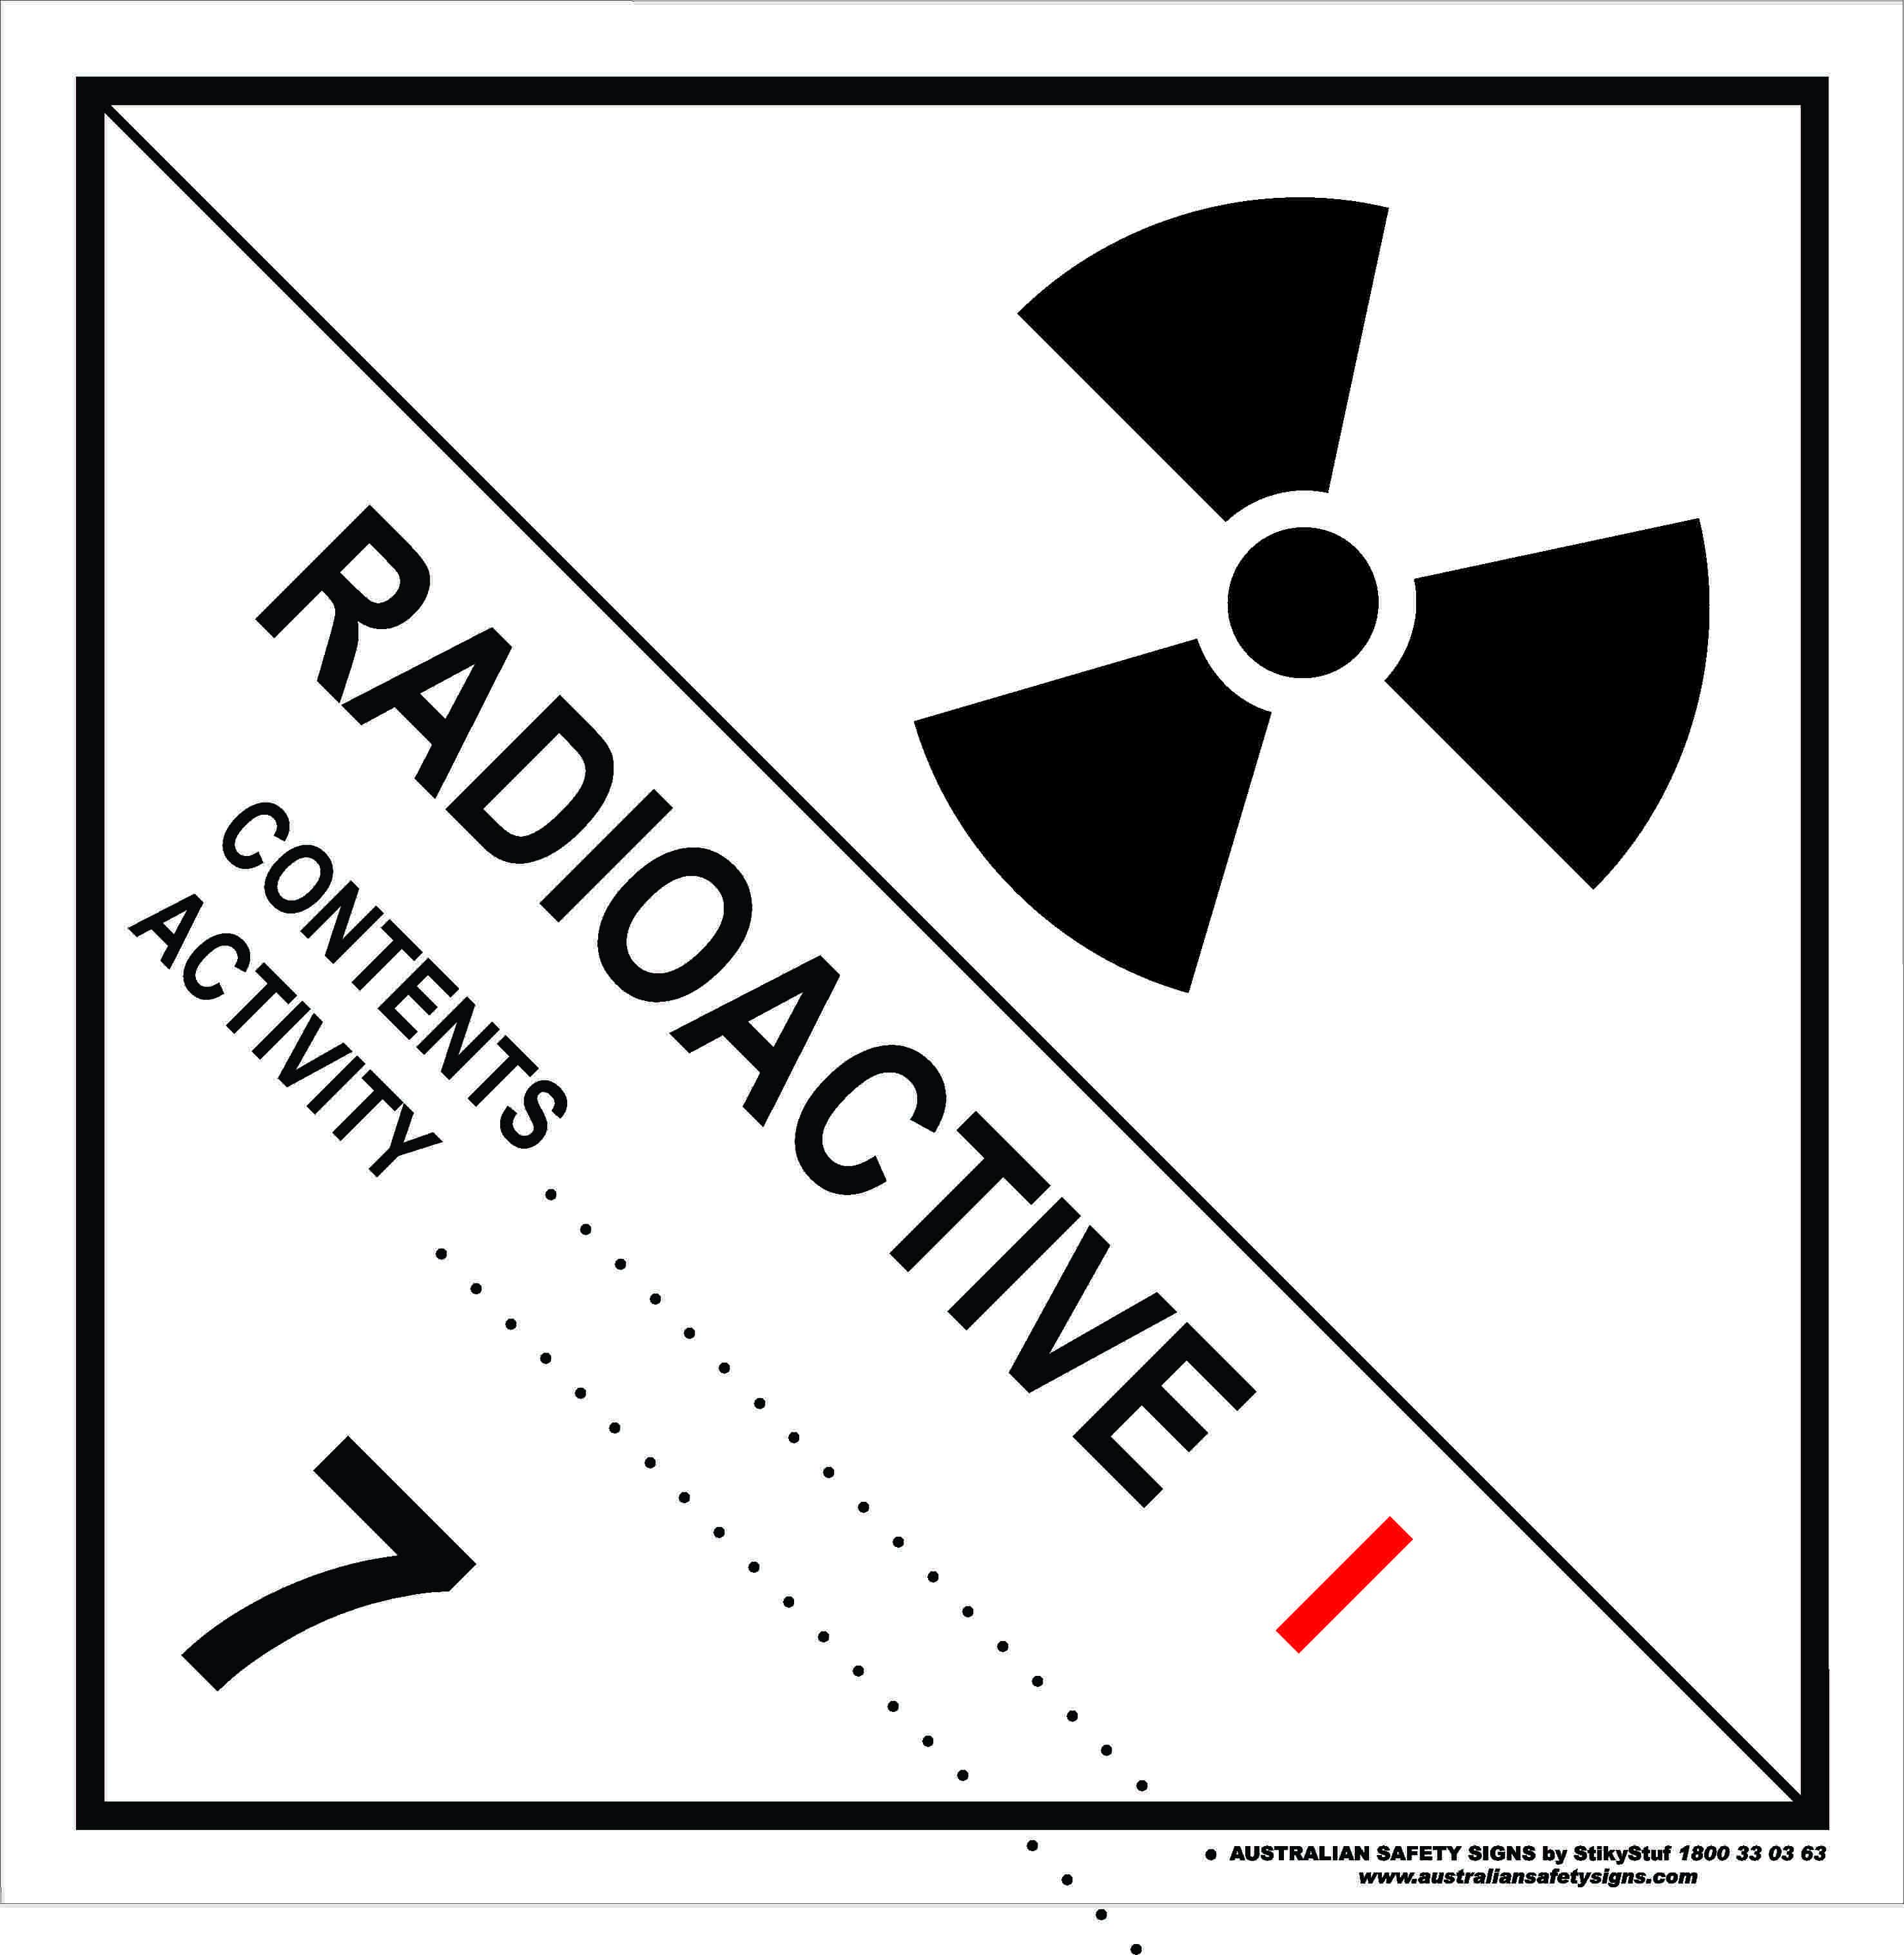 Hazchem Signs CLASS 7 - RADIOACTIVE - CATEGORY 1